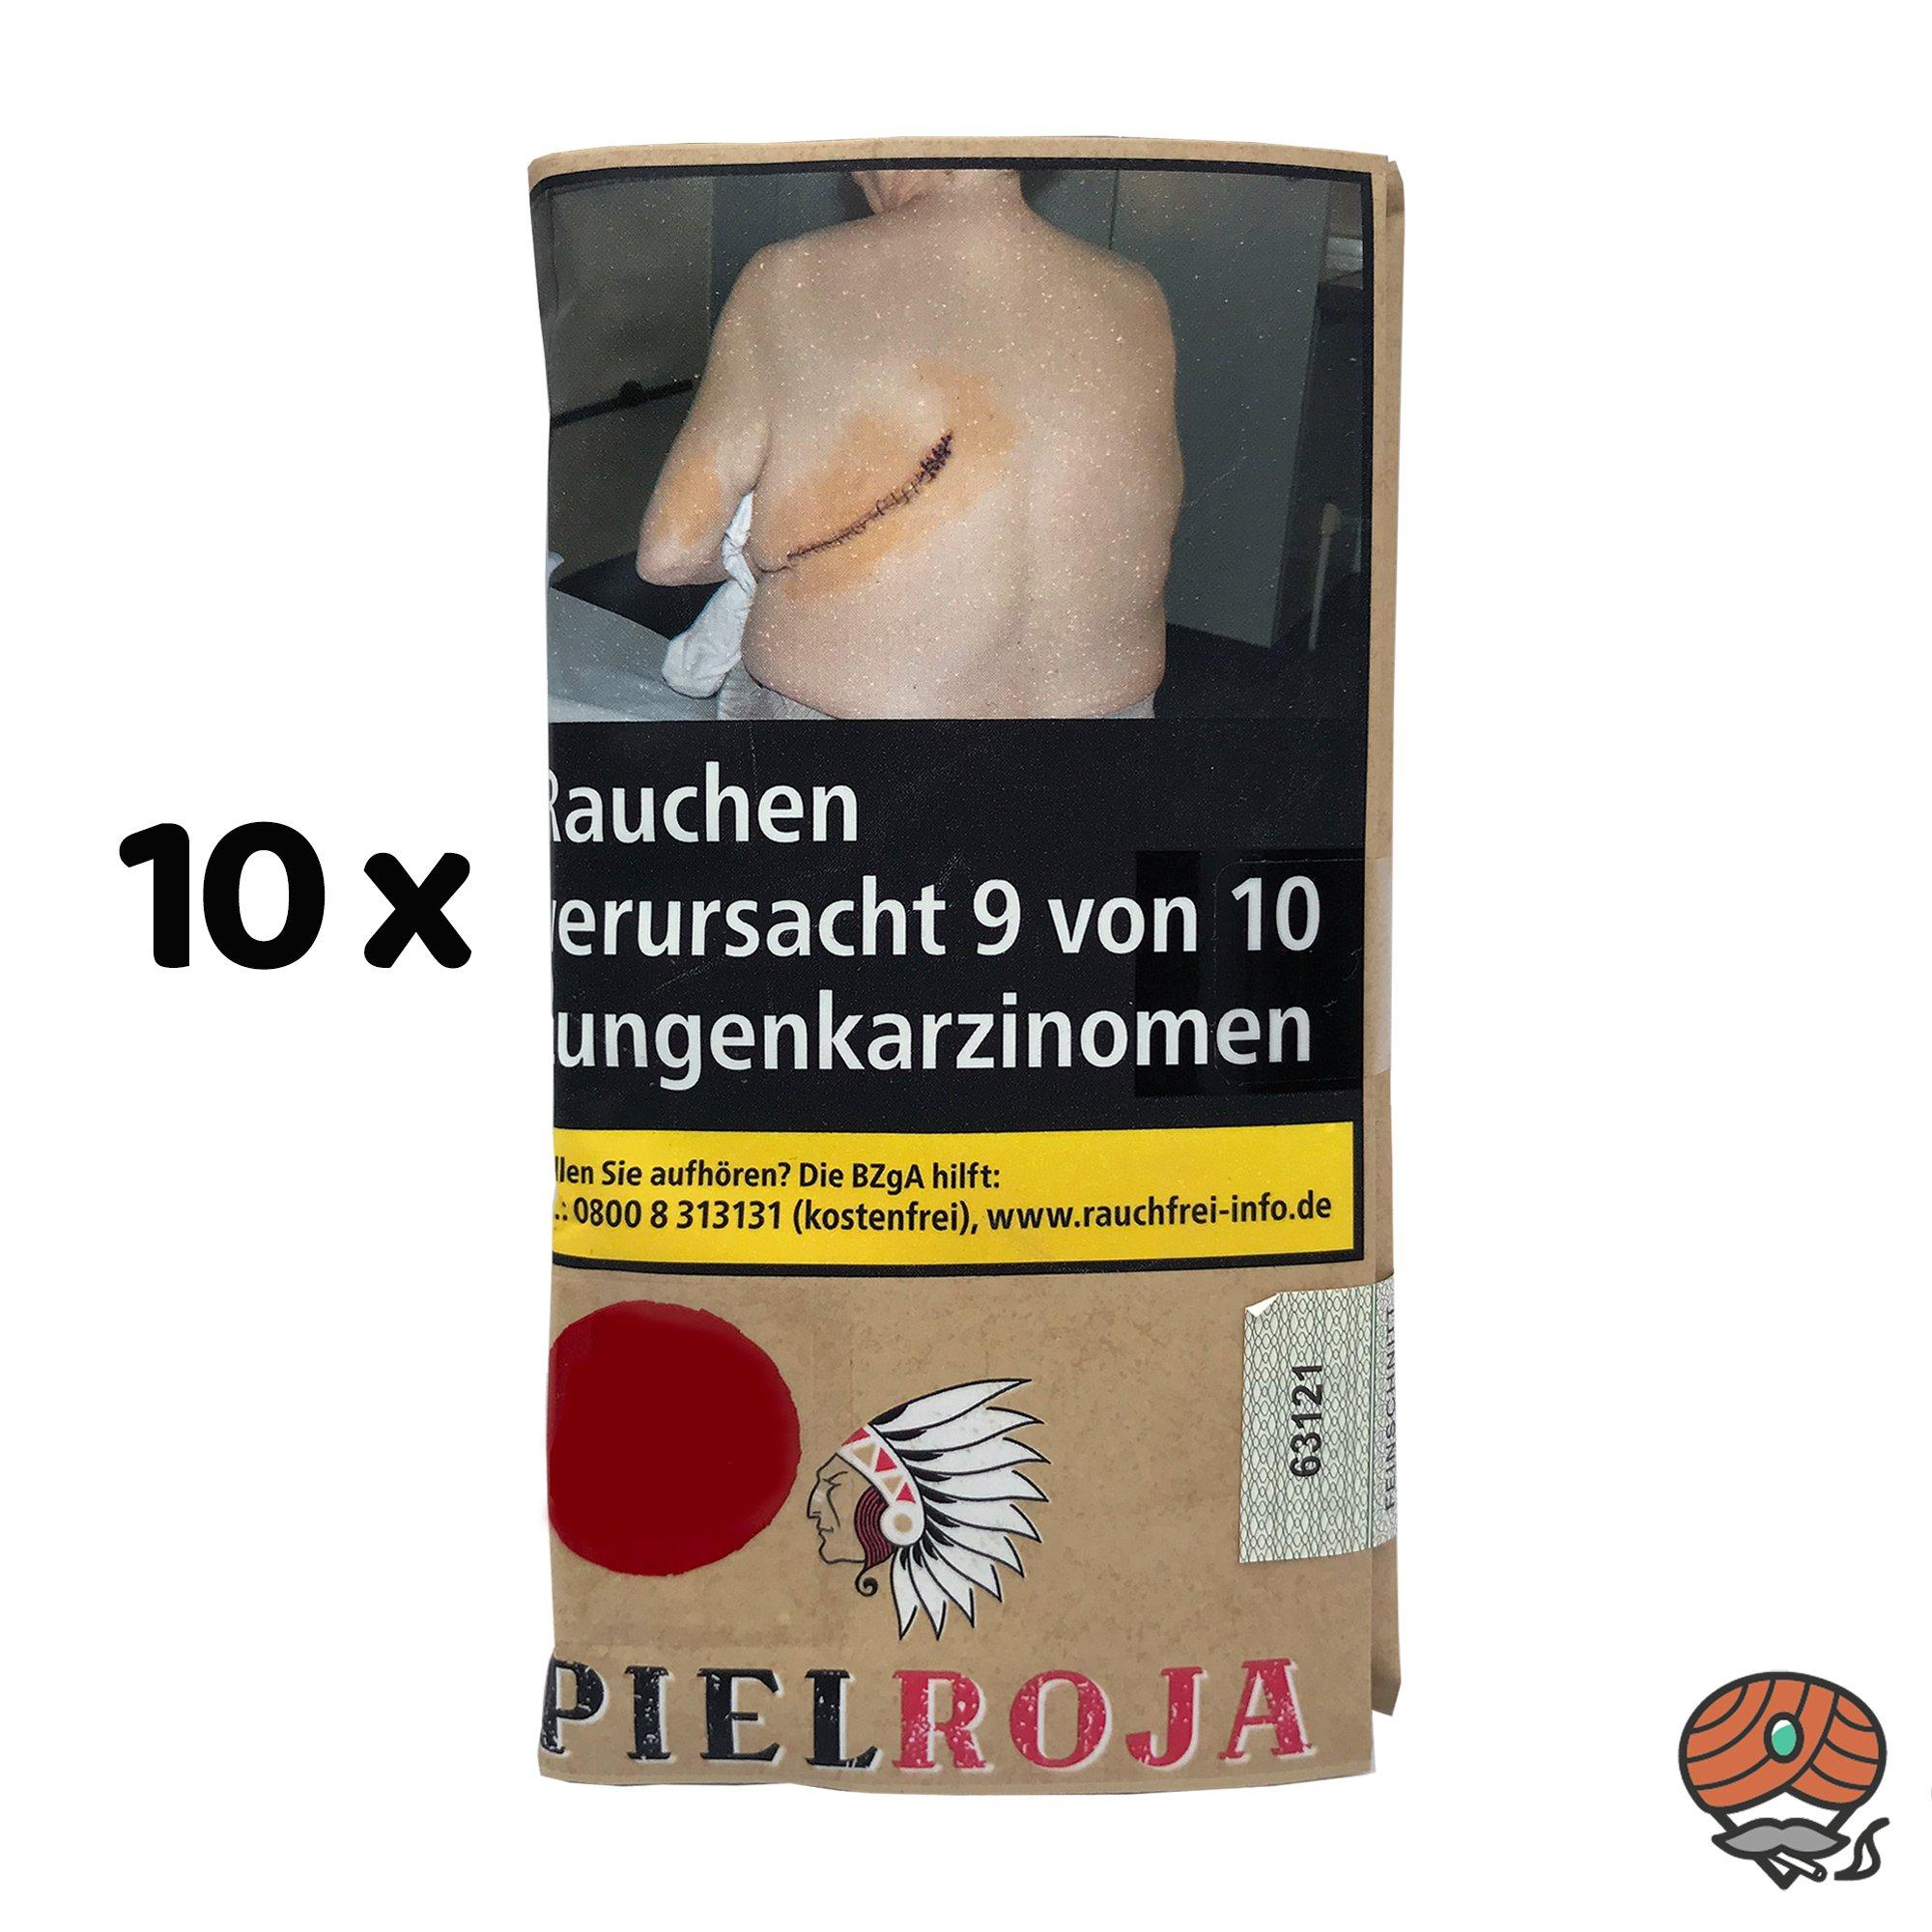 10 x Pielroja Rolling Tabacco 30g Drehtabak Zigarettentabak